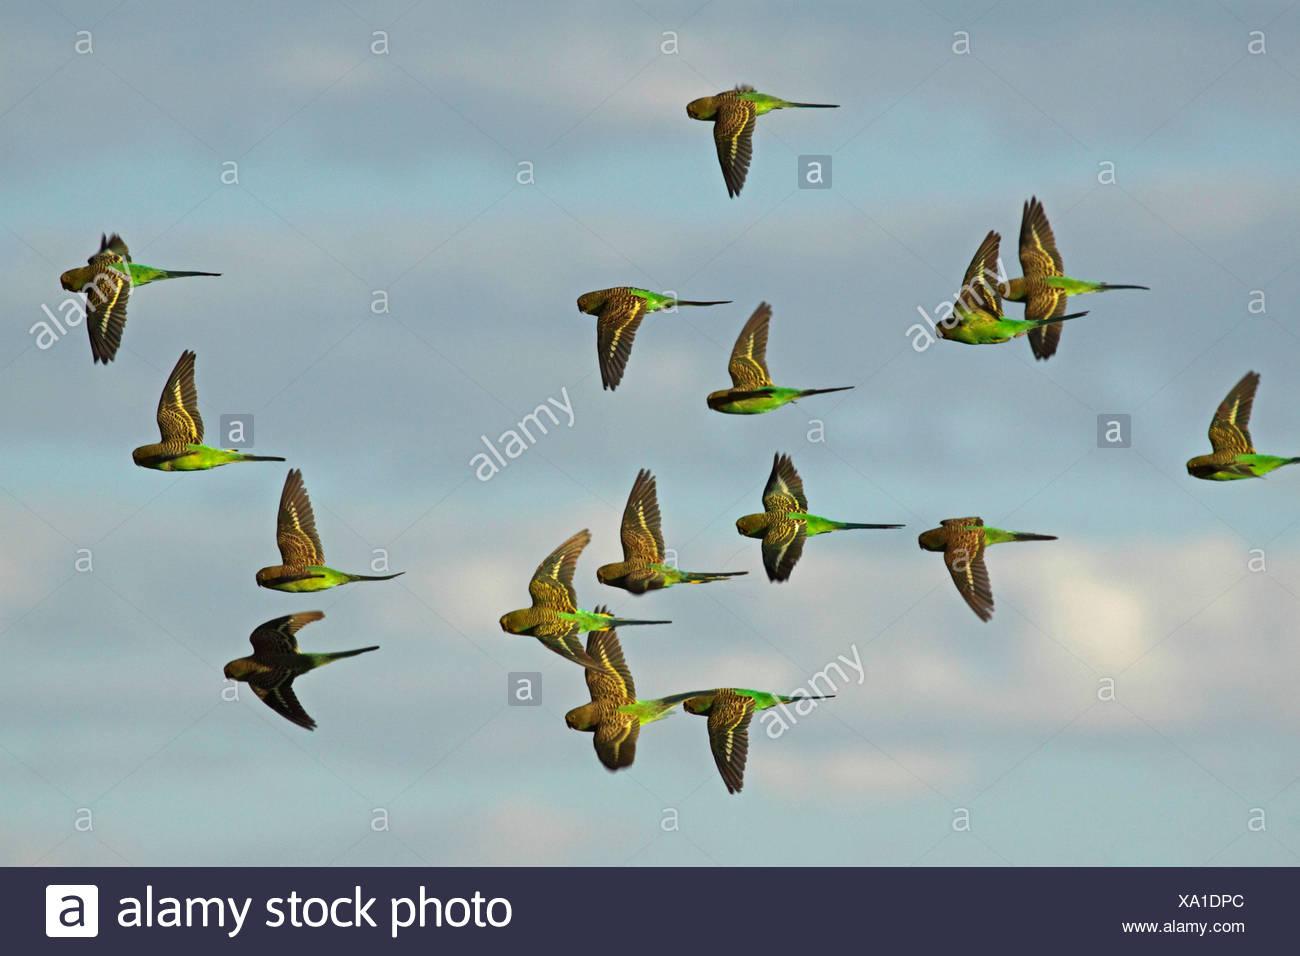 budgerigar, budgie, parakeet (Melopsittacus undulatus), flying flock, Australia, Northern Territory, Western MacDonnell Ranges - Stock Image